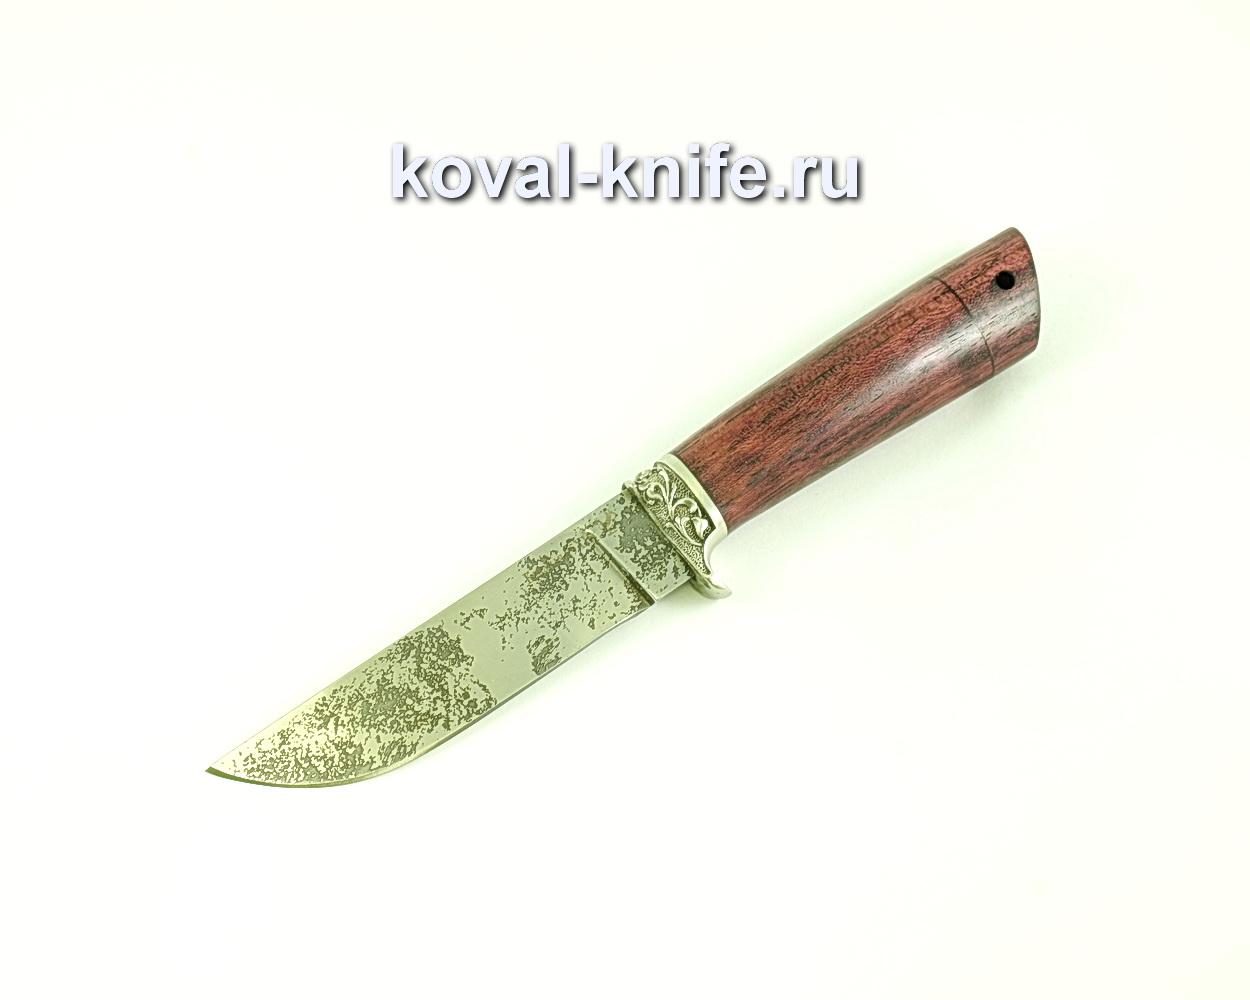 Нож Белка (сталь 95х18), рукоять амарант, литье A272